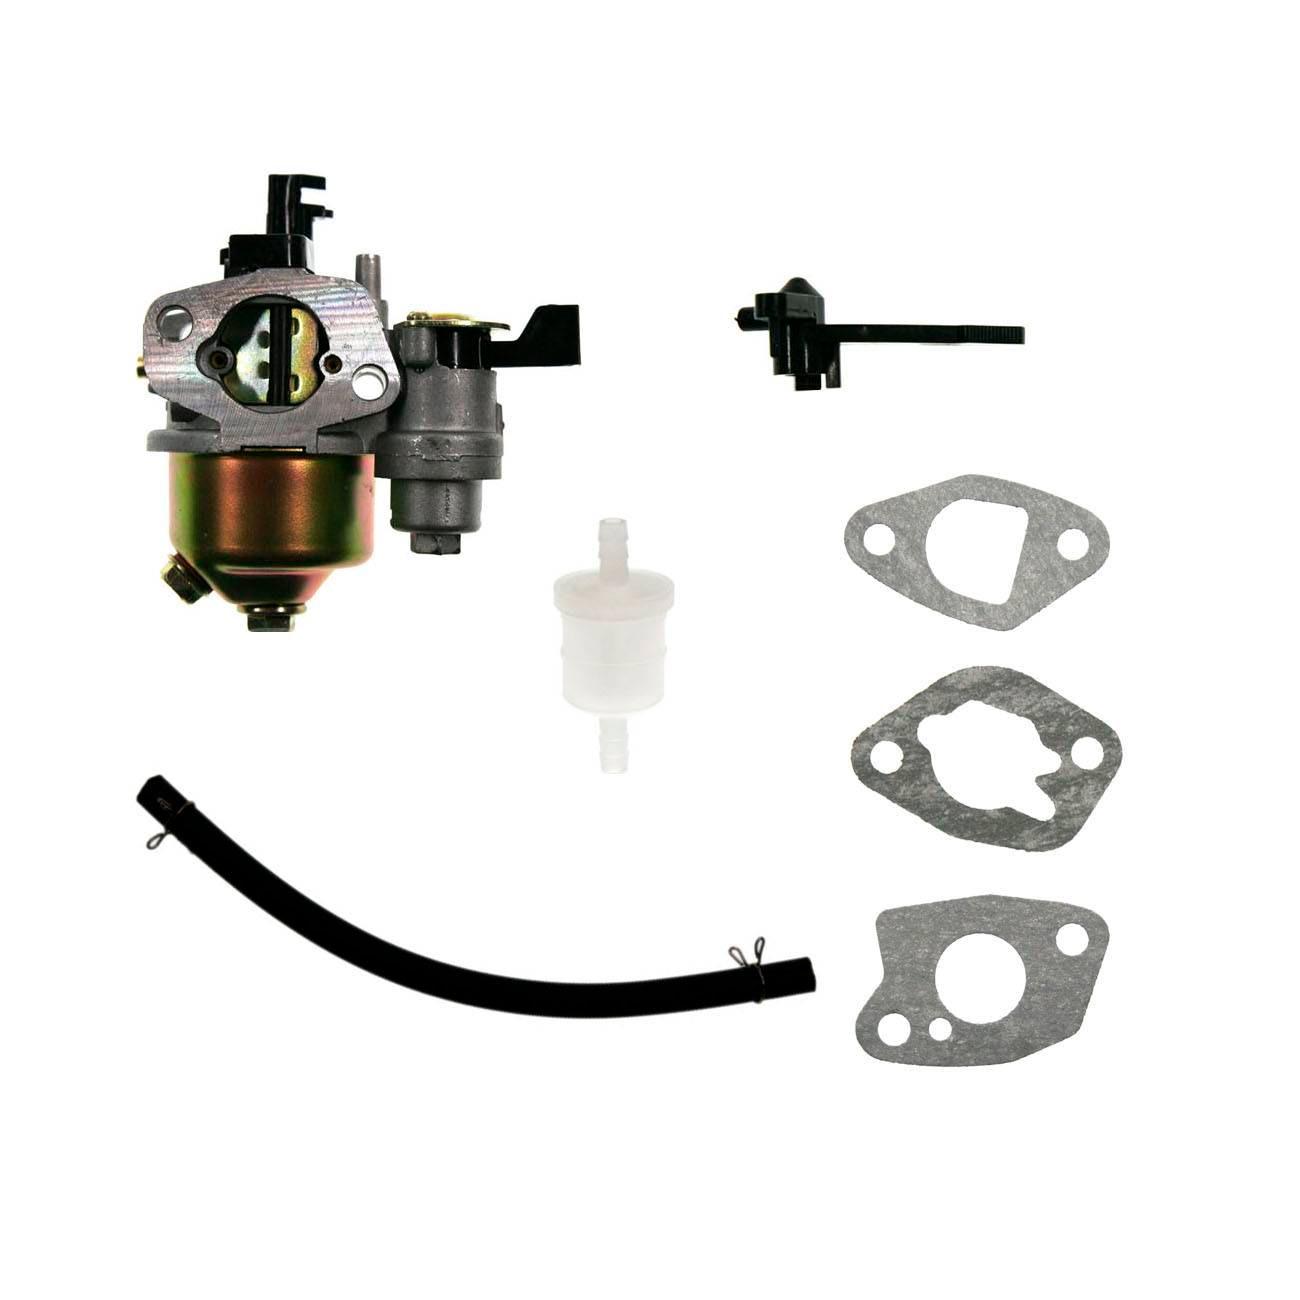 Carburetor Gasket for Harbor Freight Greyhound 66014 66015 196cc 6.5hp Lifan Gas